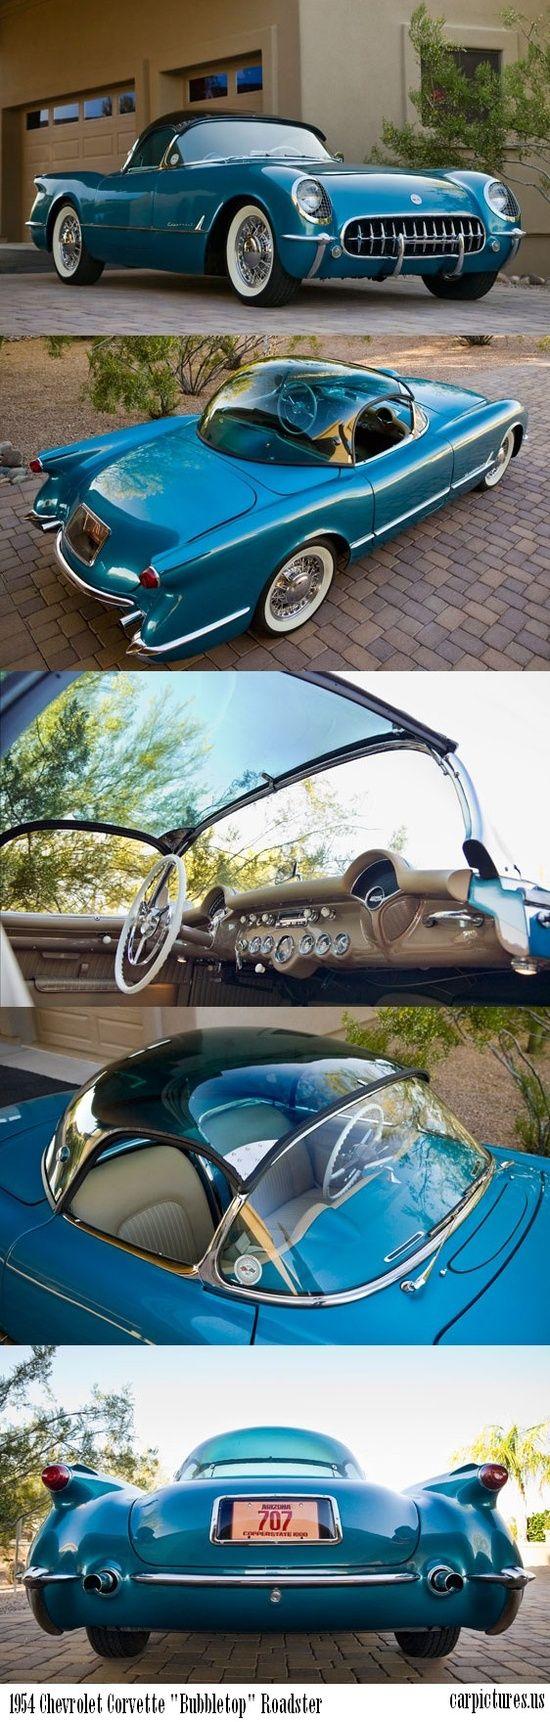 "1954 Chevrolet Corvette ""Bubbletop"" Roadster - Source RM... #Corvette #ChevroletCorvette...Brought to you by House of Insurance in #EugeneOregon call for a free price comparison 541-345-4191."